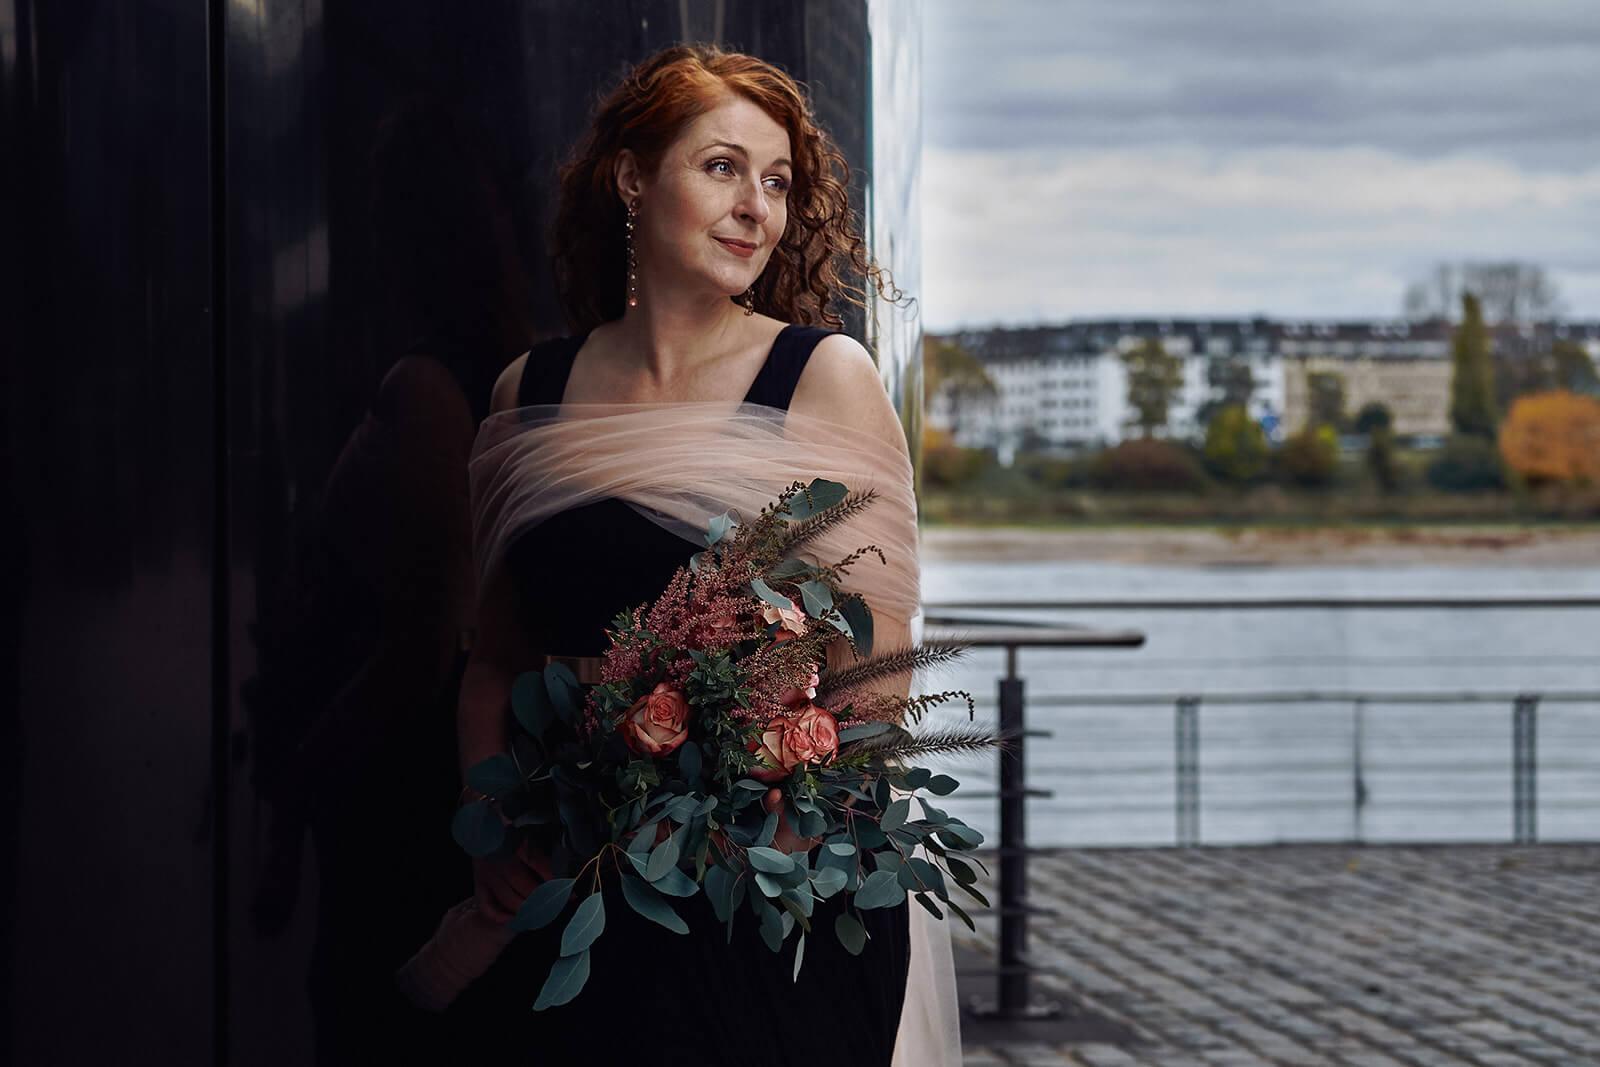 Linago Paarfotoshooting After wedding Fotoshooting Köln